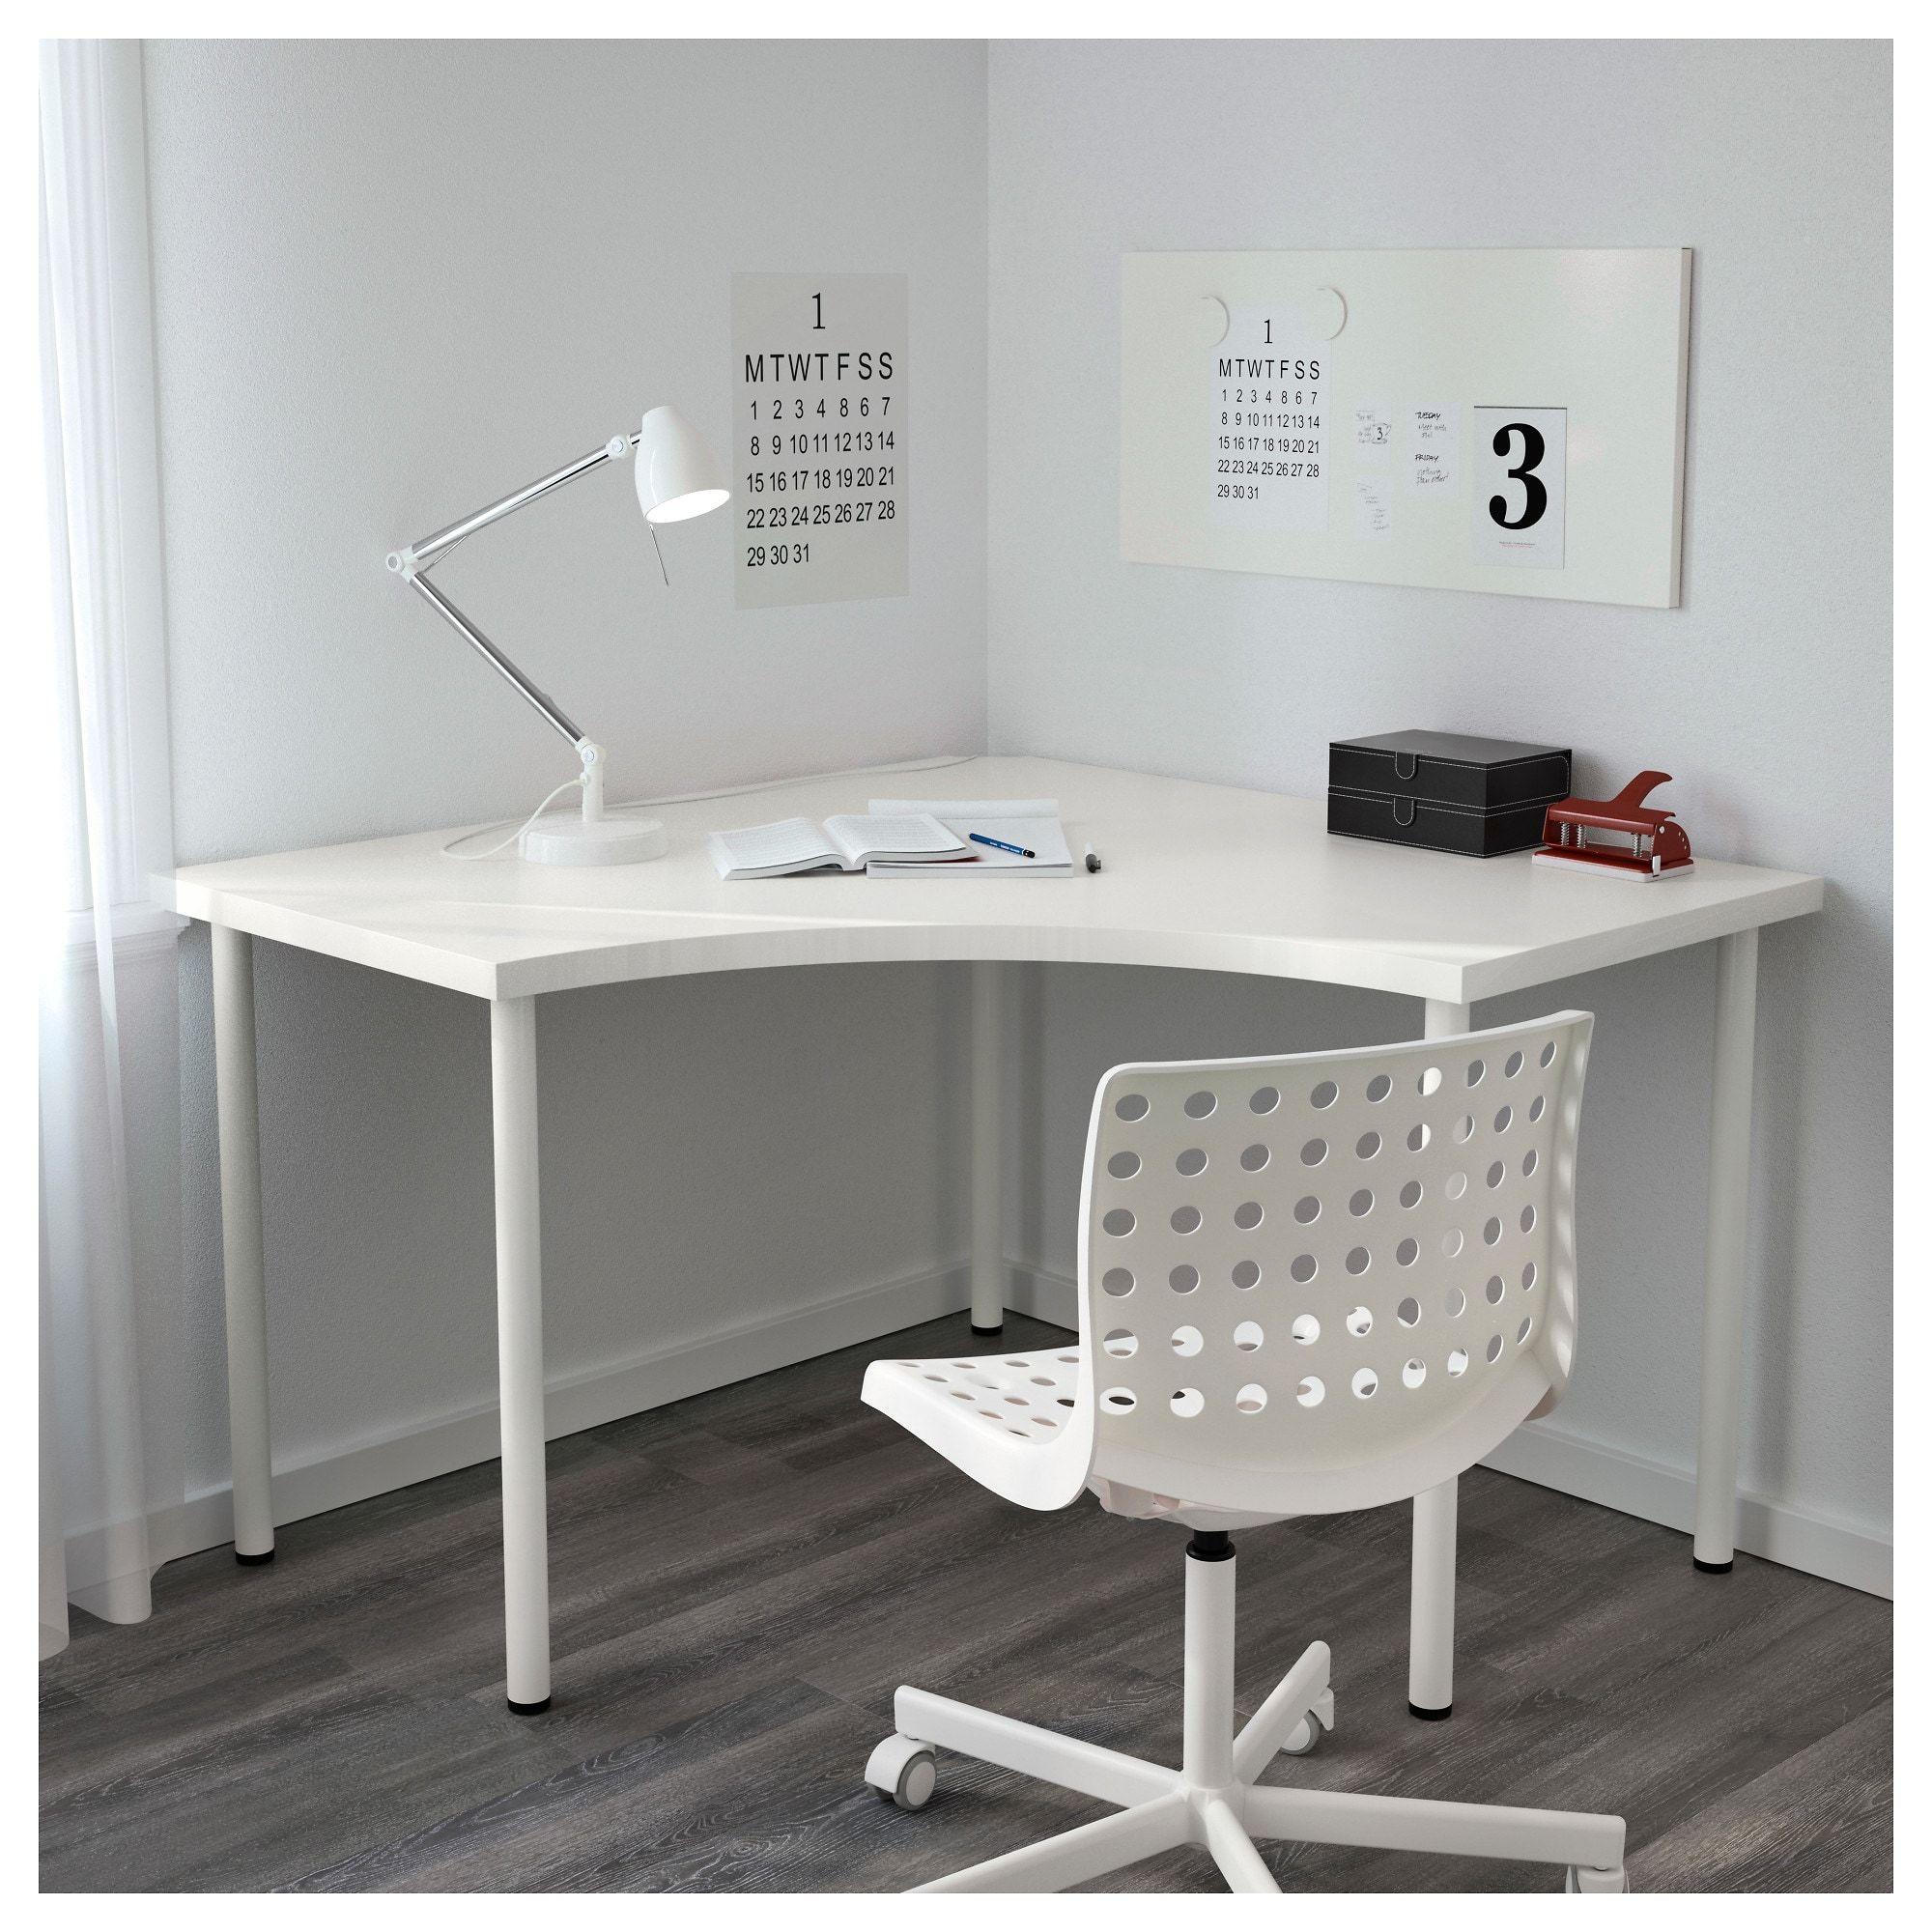 Linnmon Adils Corner Table White 47 1 4x47 1 4 Ikea Corner Table Ikea Home Office Design Ikea Corner Desk